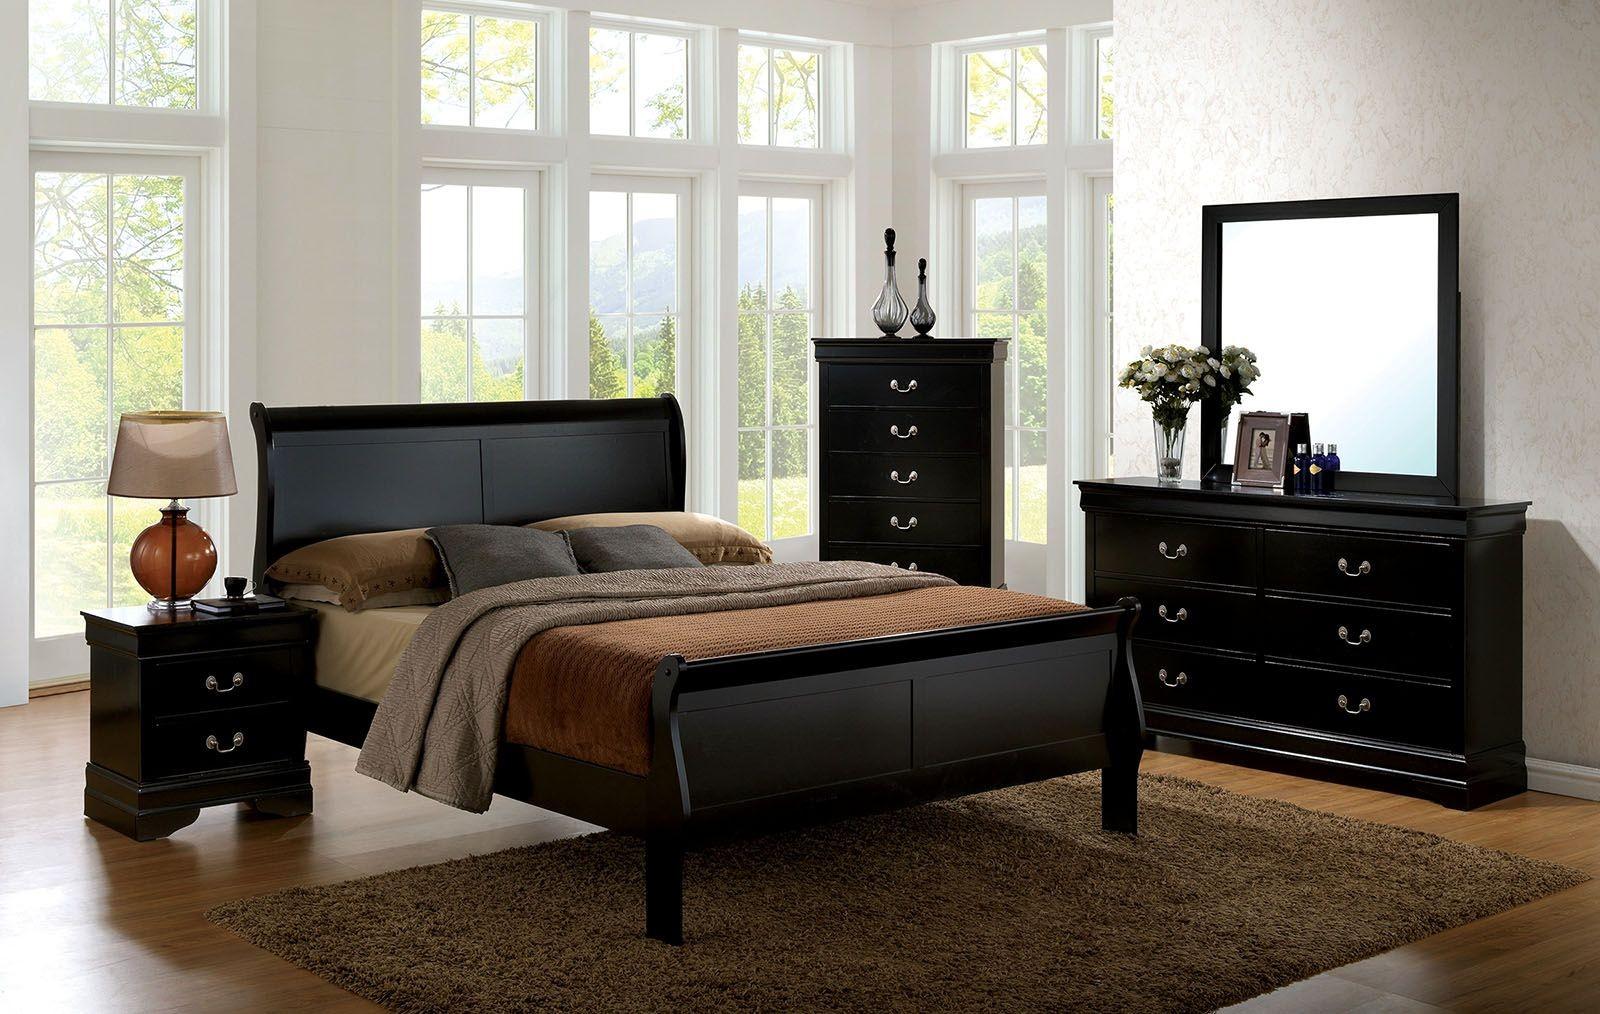 Louis philippe iii black youth panel bedroom set - Louis philippe bedroom collection ...